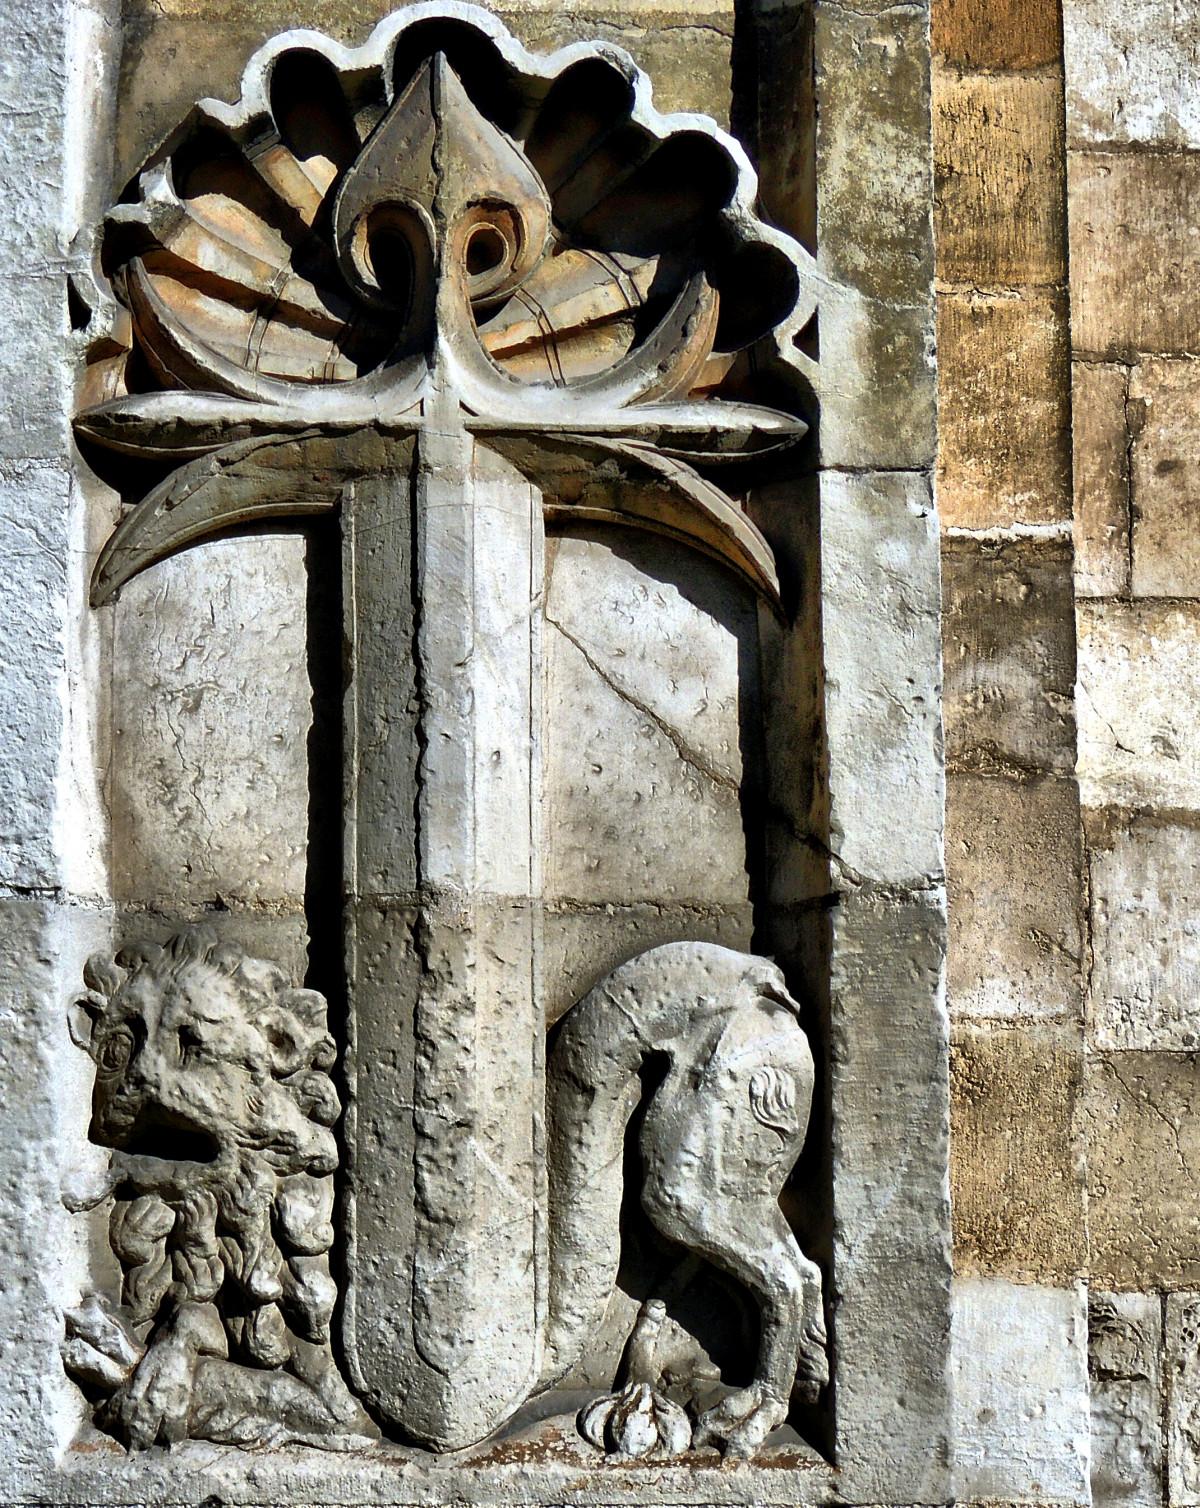 madera pared piedra monumento europa estatua